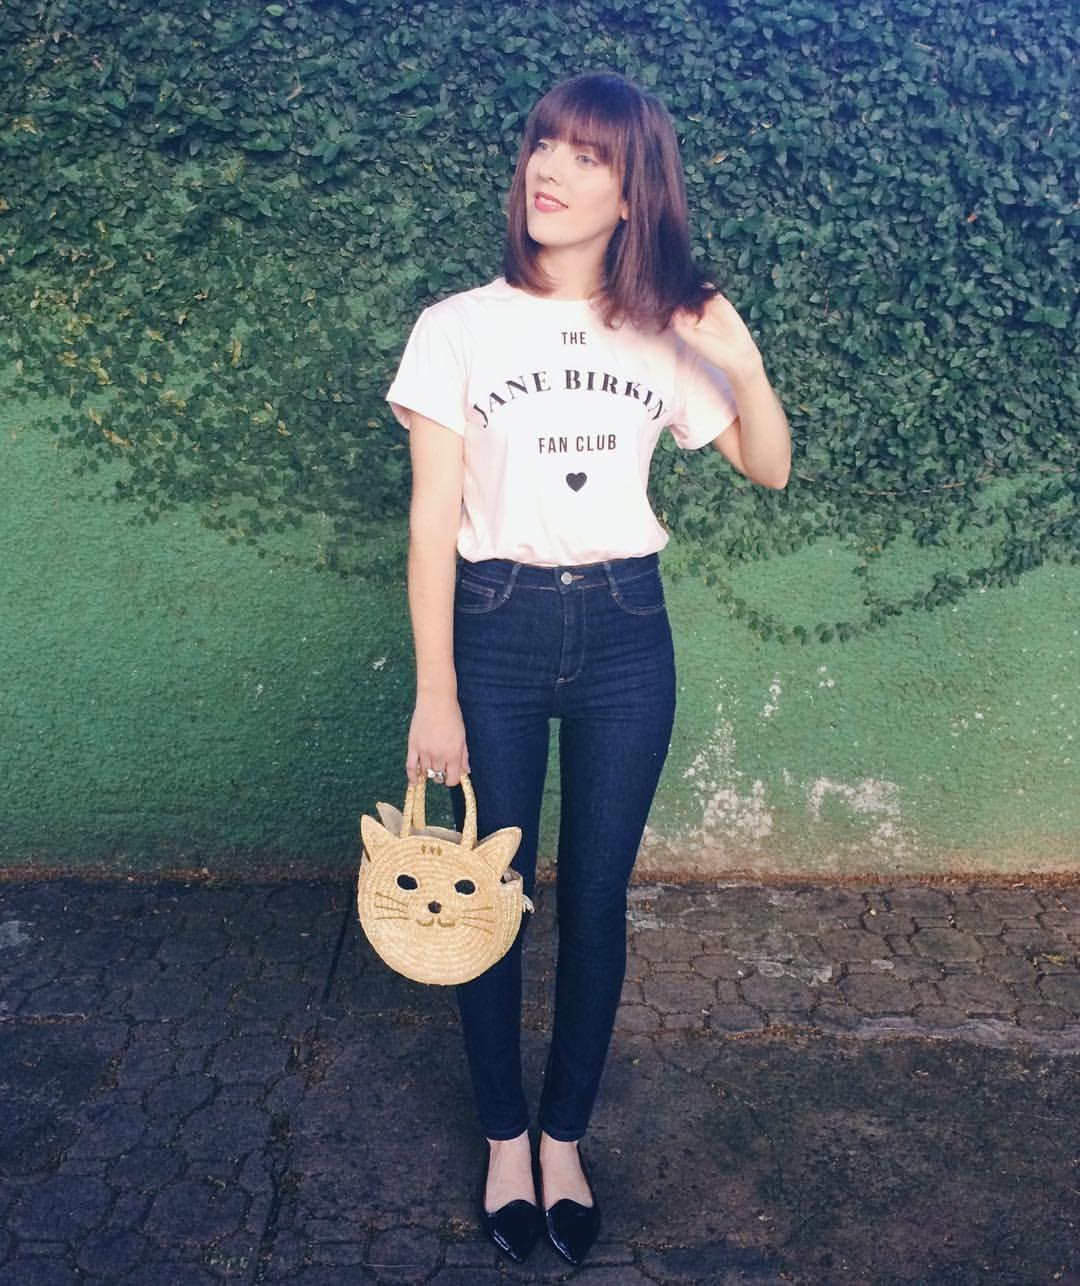 Lilian Larrañaga - Look do sábado ✨✨ #ootd #lookoftheday #janebirkin #retrogirl #vintagegirl #retrostyle #retrofashion #tshirt #catbag #jeans #lookdodia